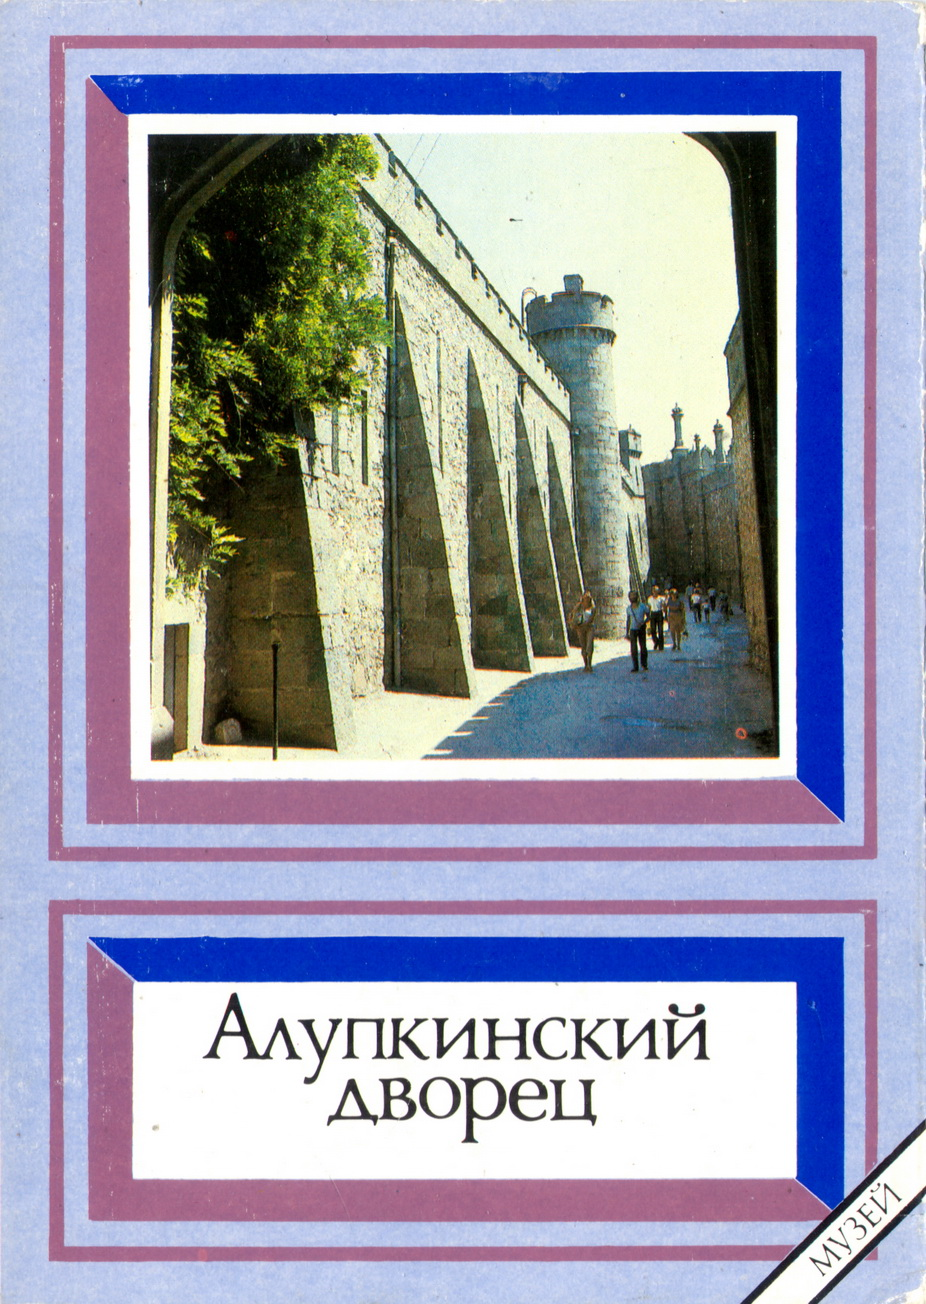 Alupkinskiy dvorets - title01_resize